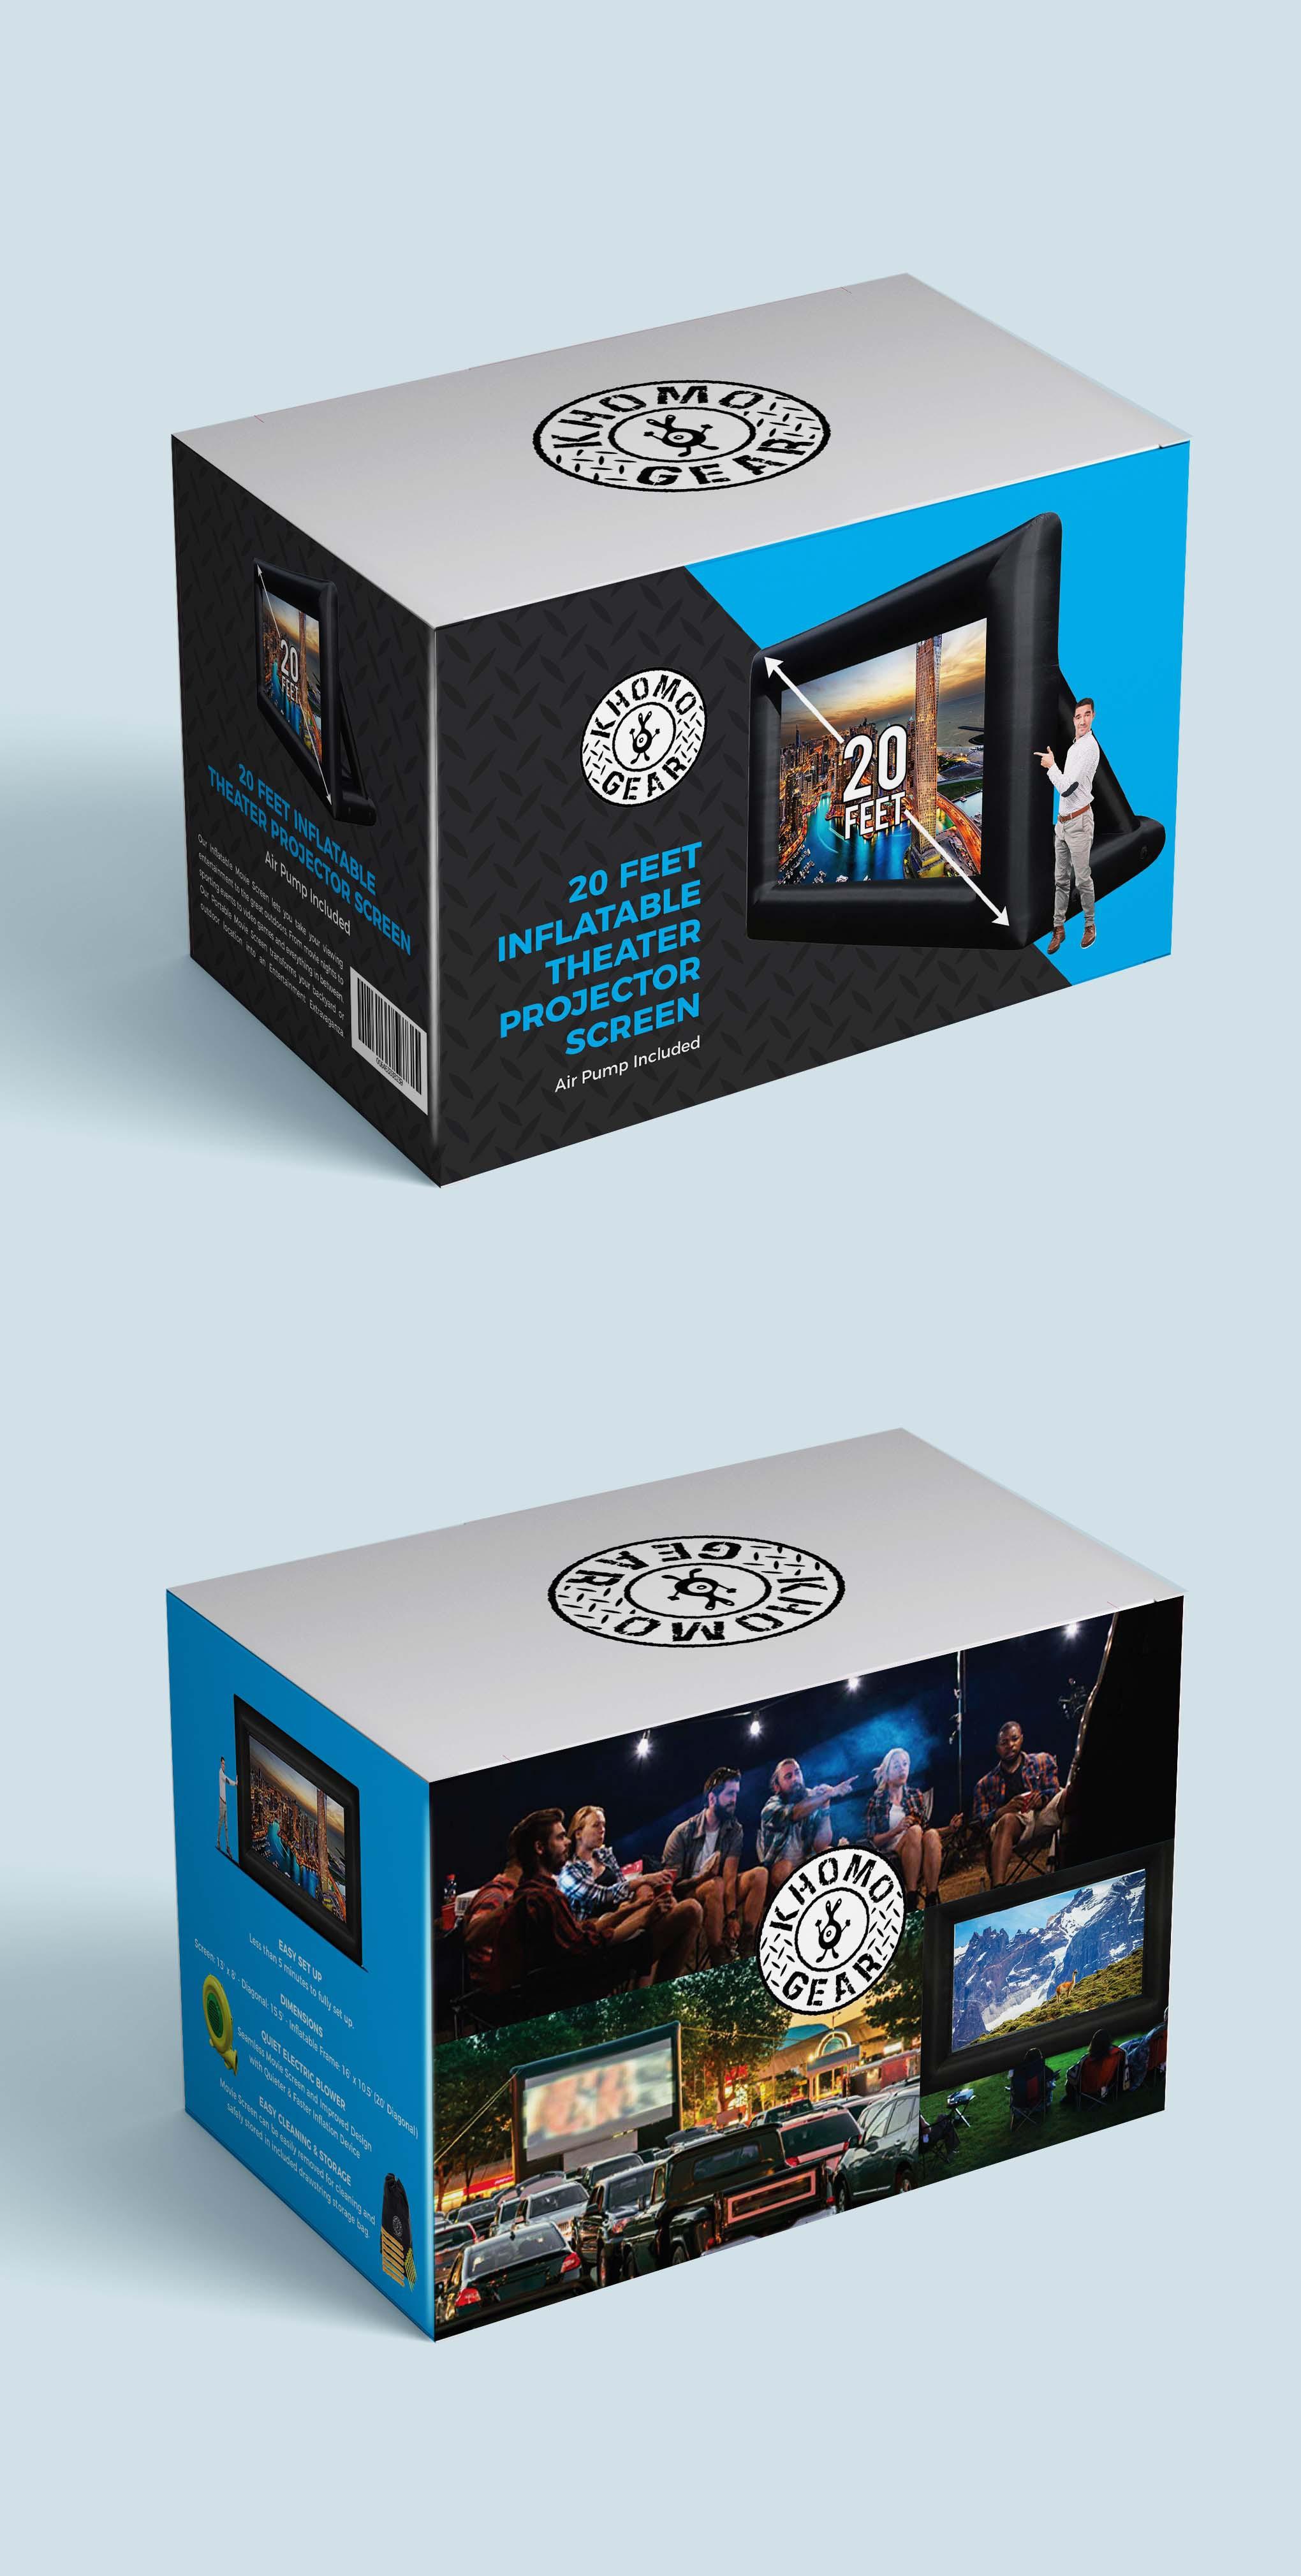 Carton Box Design for Jumbo Inflatable Movie Screen